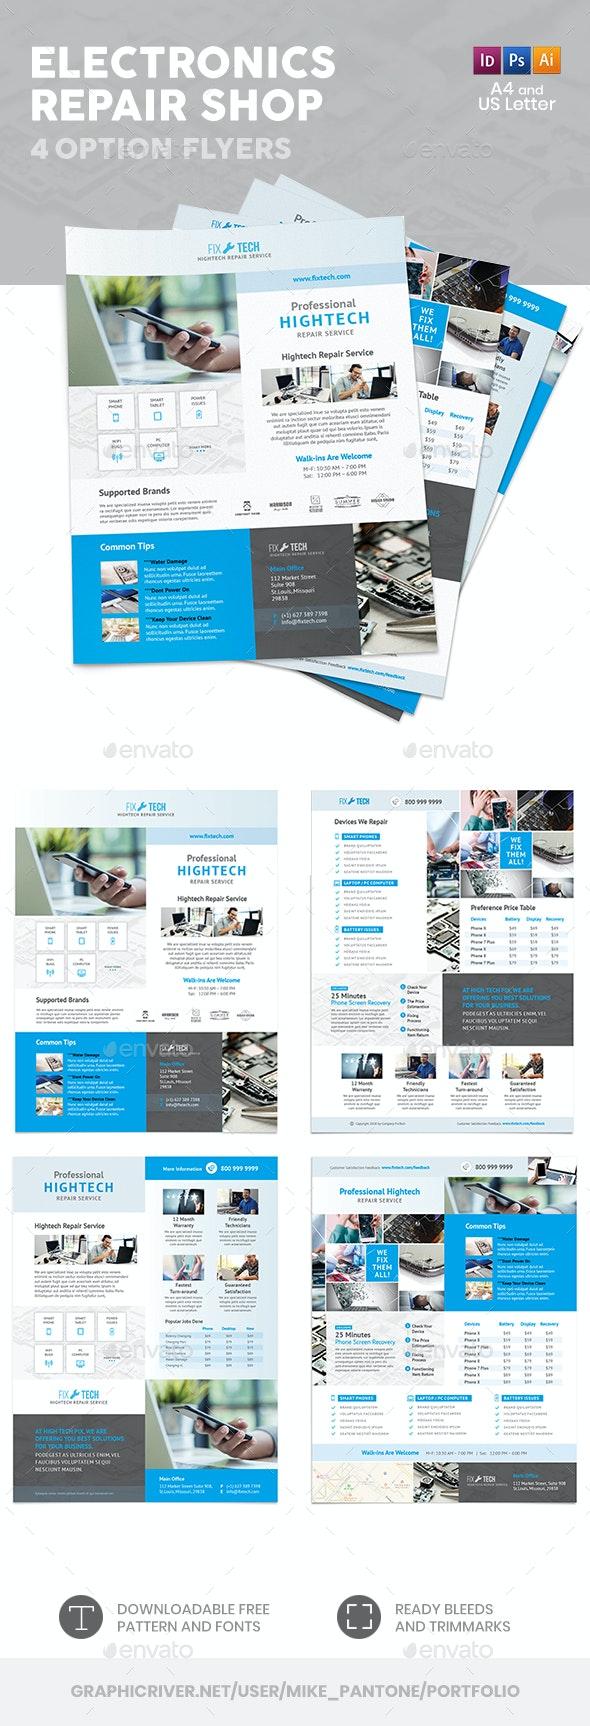 Electronics Repair Shop Flyers – 4 Options - Corporate Flyers